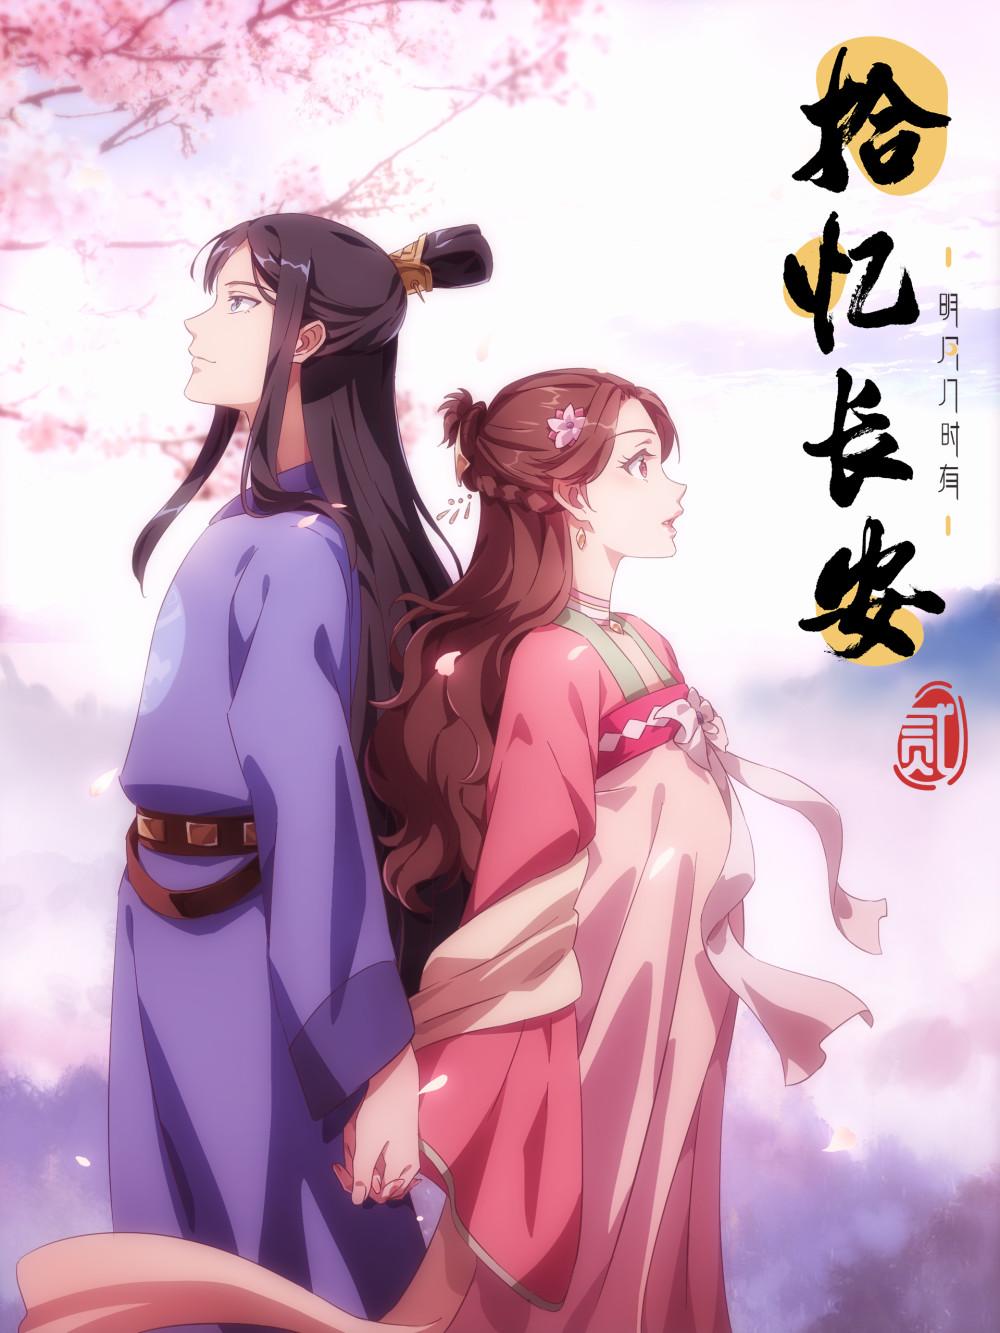 [国漫][拾忆长安·明月几时有 第2季][Shi Yi Chang An:Ming Yue Ji Shi You Ⅱ][2021][01-12 Fin+SP][AVC][GB][1080P][GM-Team]